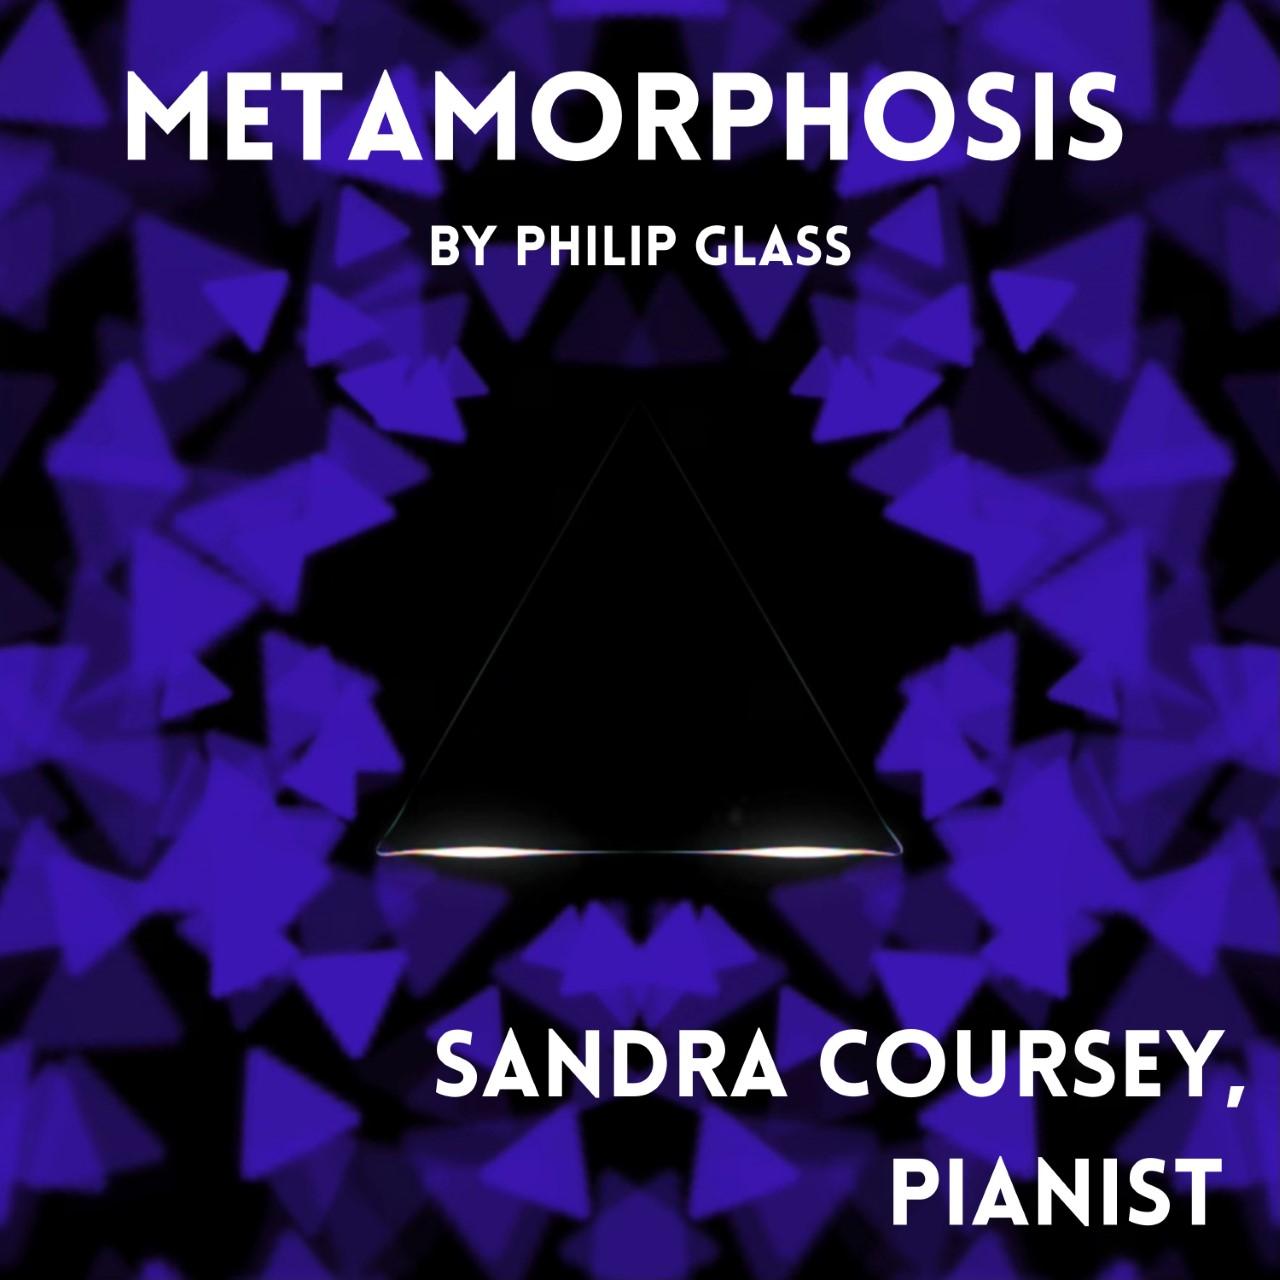 Philip Glass, Metamorphosis 1-V